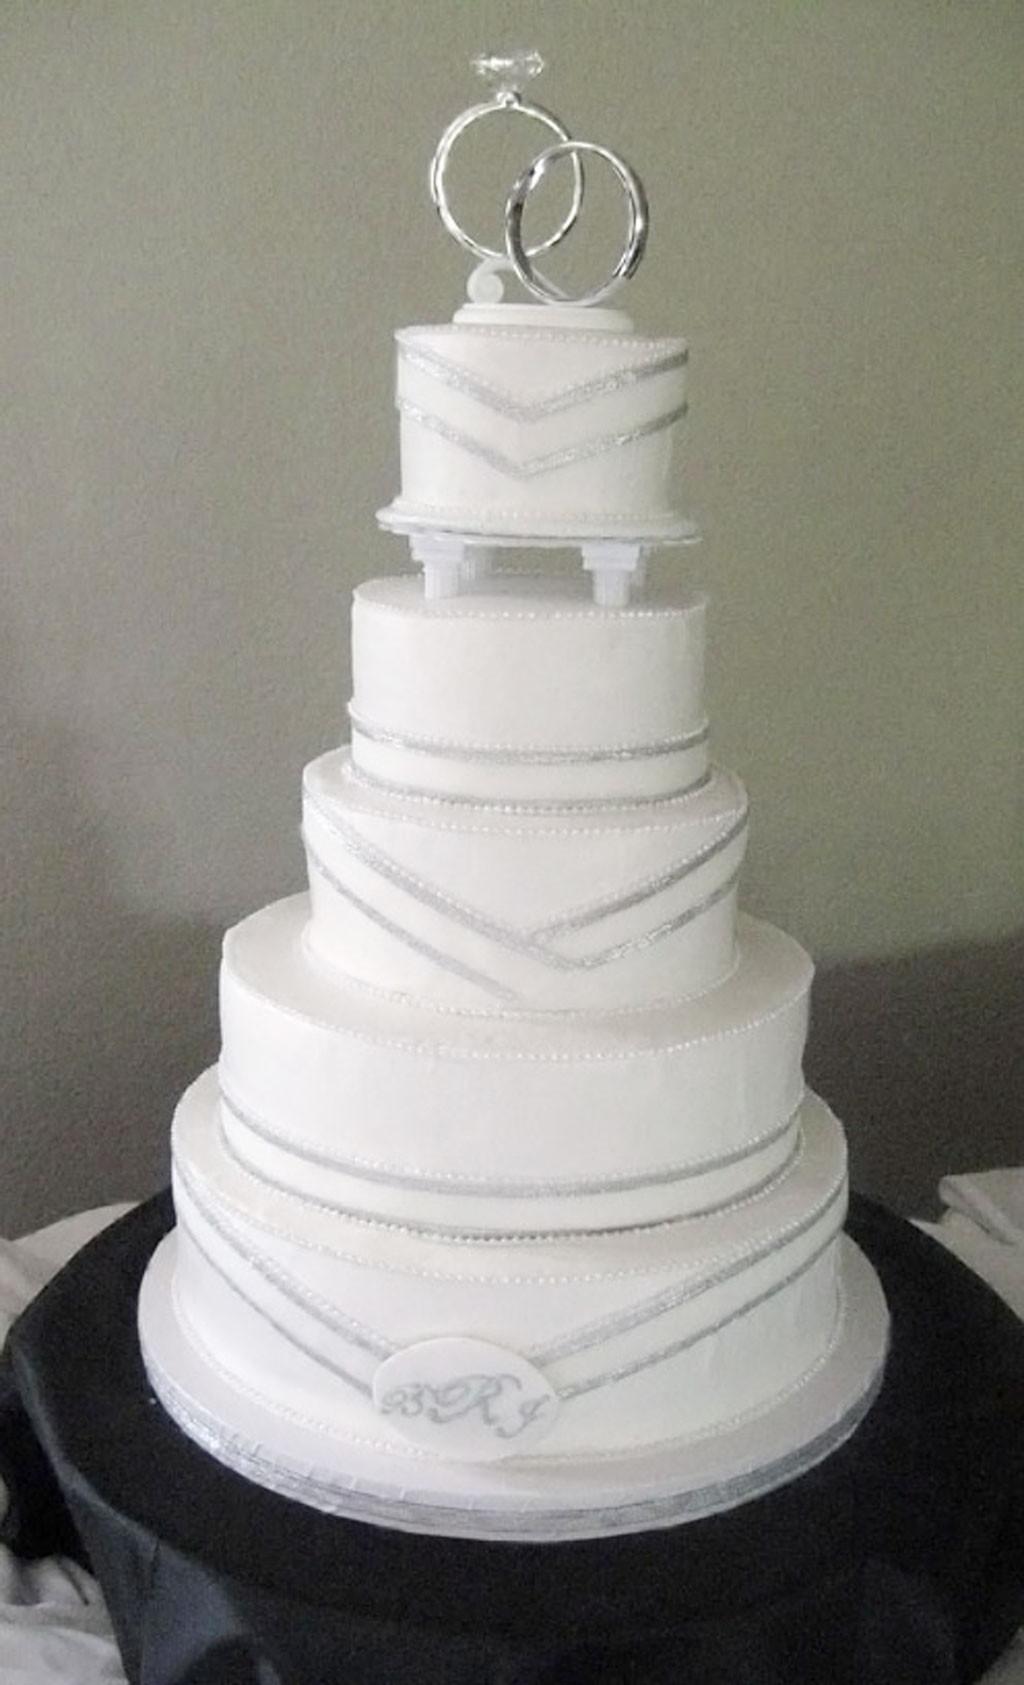 Simple Wedding Cakes Ideas  Simple Silver Wedding Cakes Wedding Cake Cake Ideas by